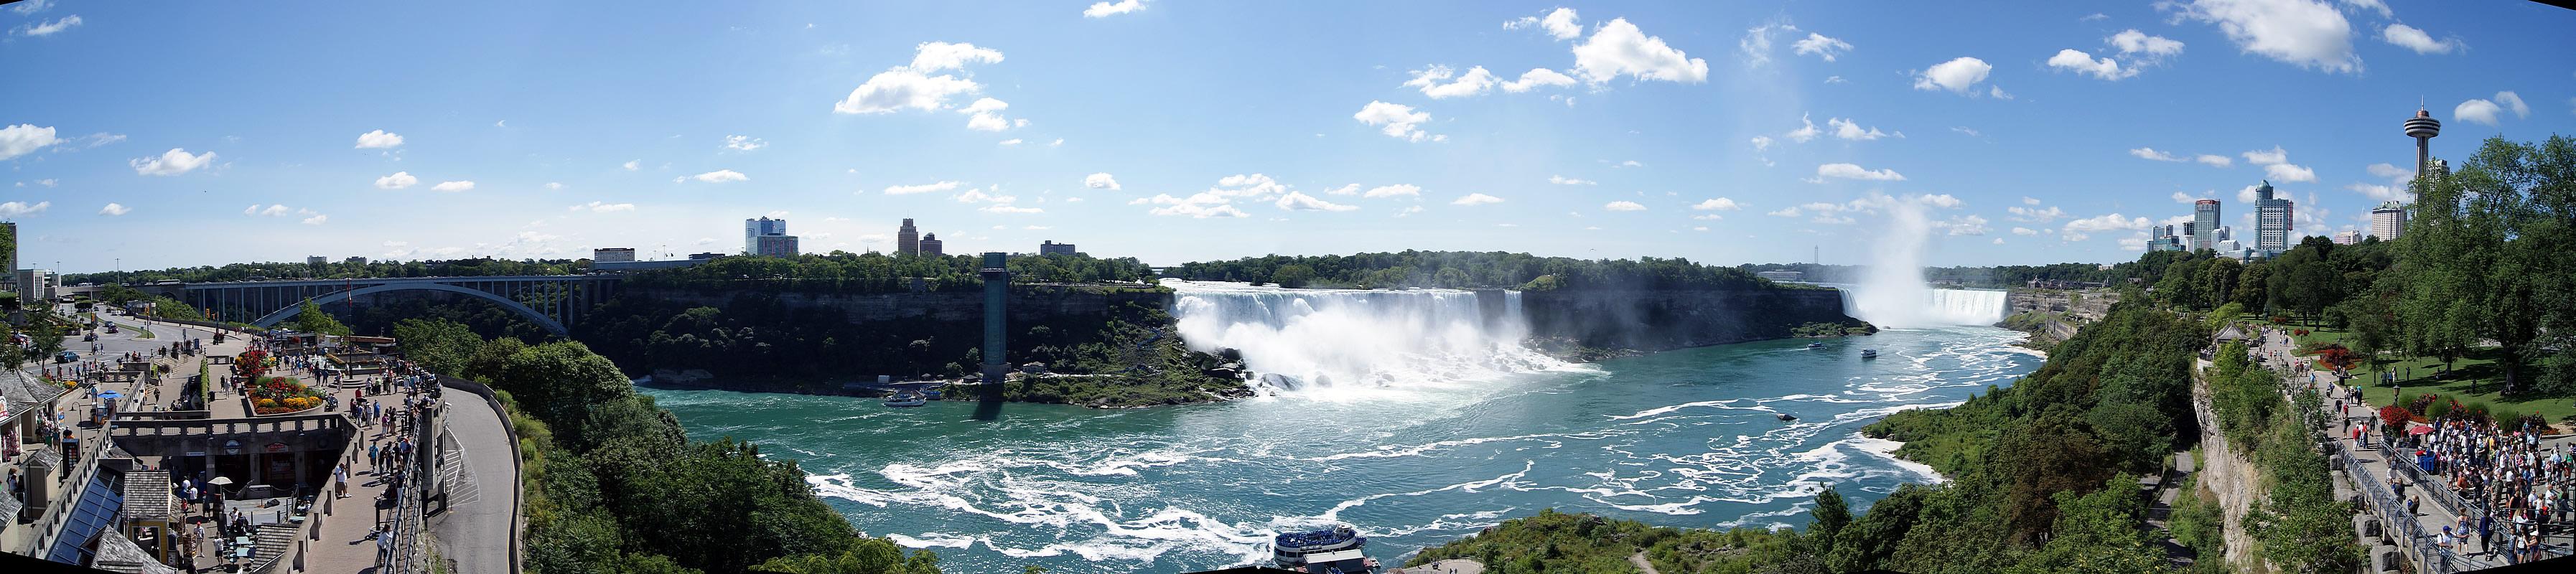 Victoria Falls Live Wallpaper Niagara Falls Summer Panorama Photo